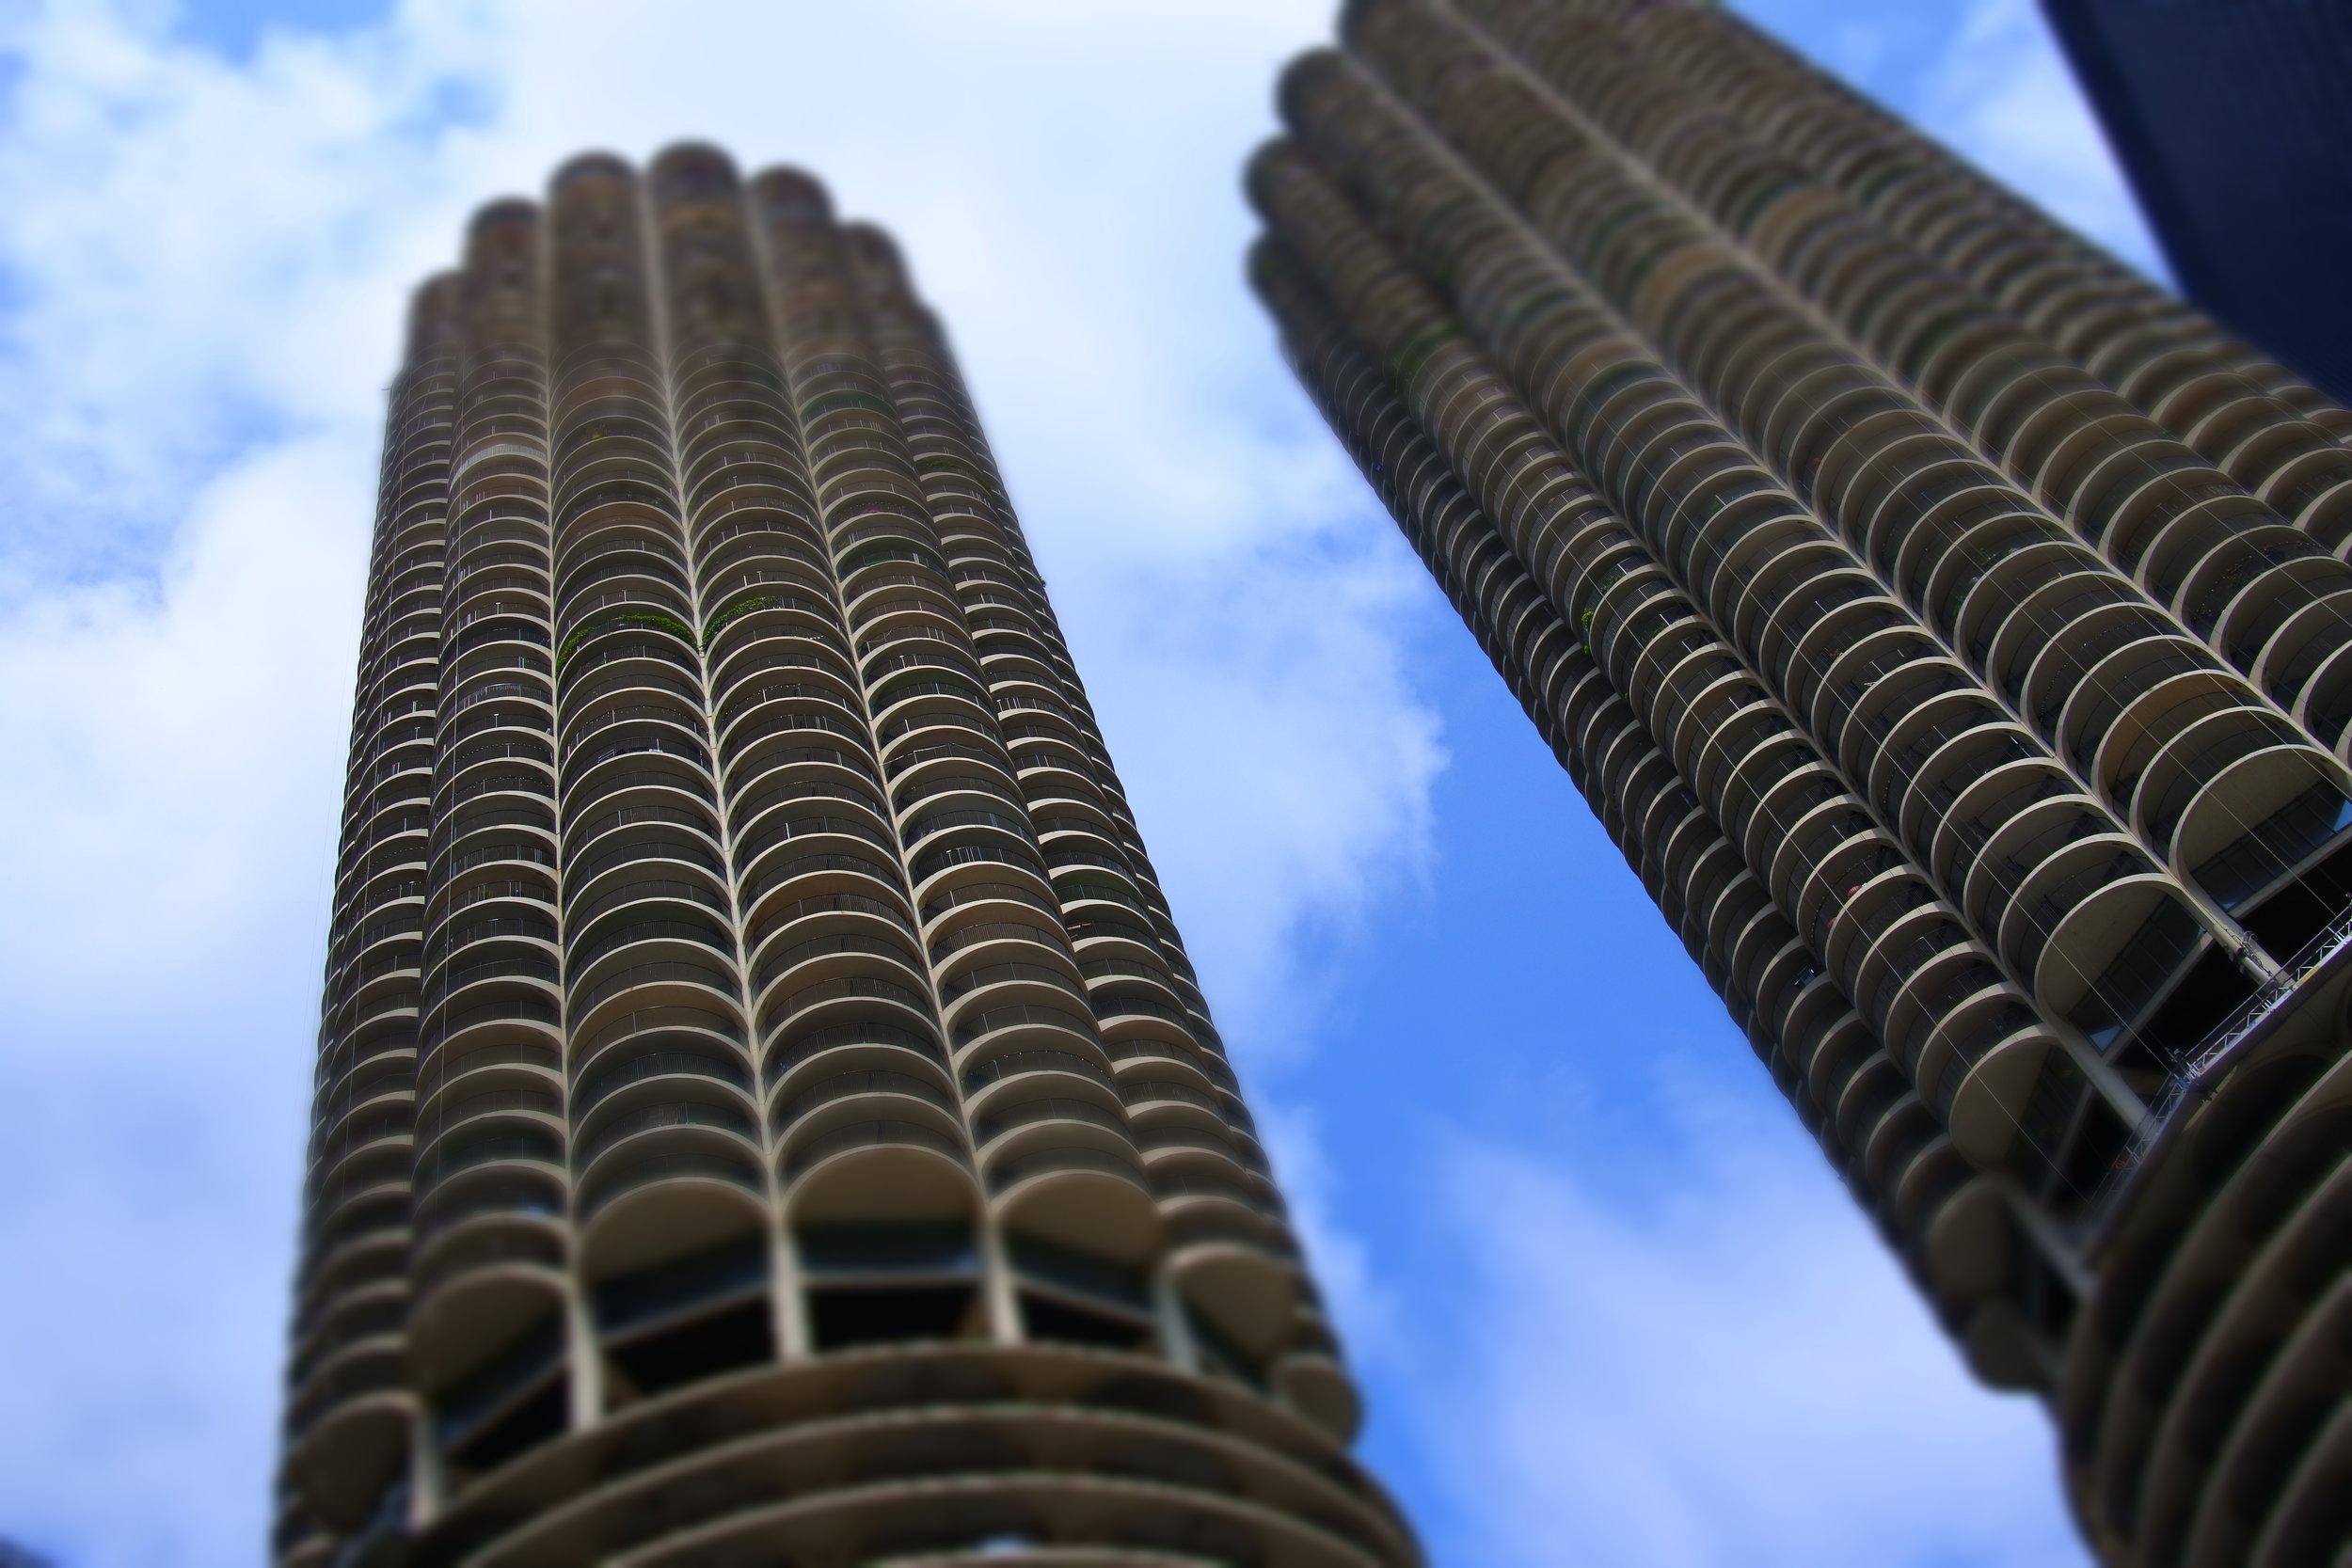 Marina City (aka the Corn Cob Buildings) by architect Bertrand Goldberg.